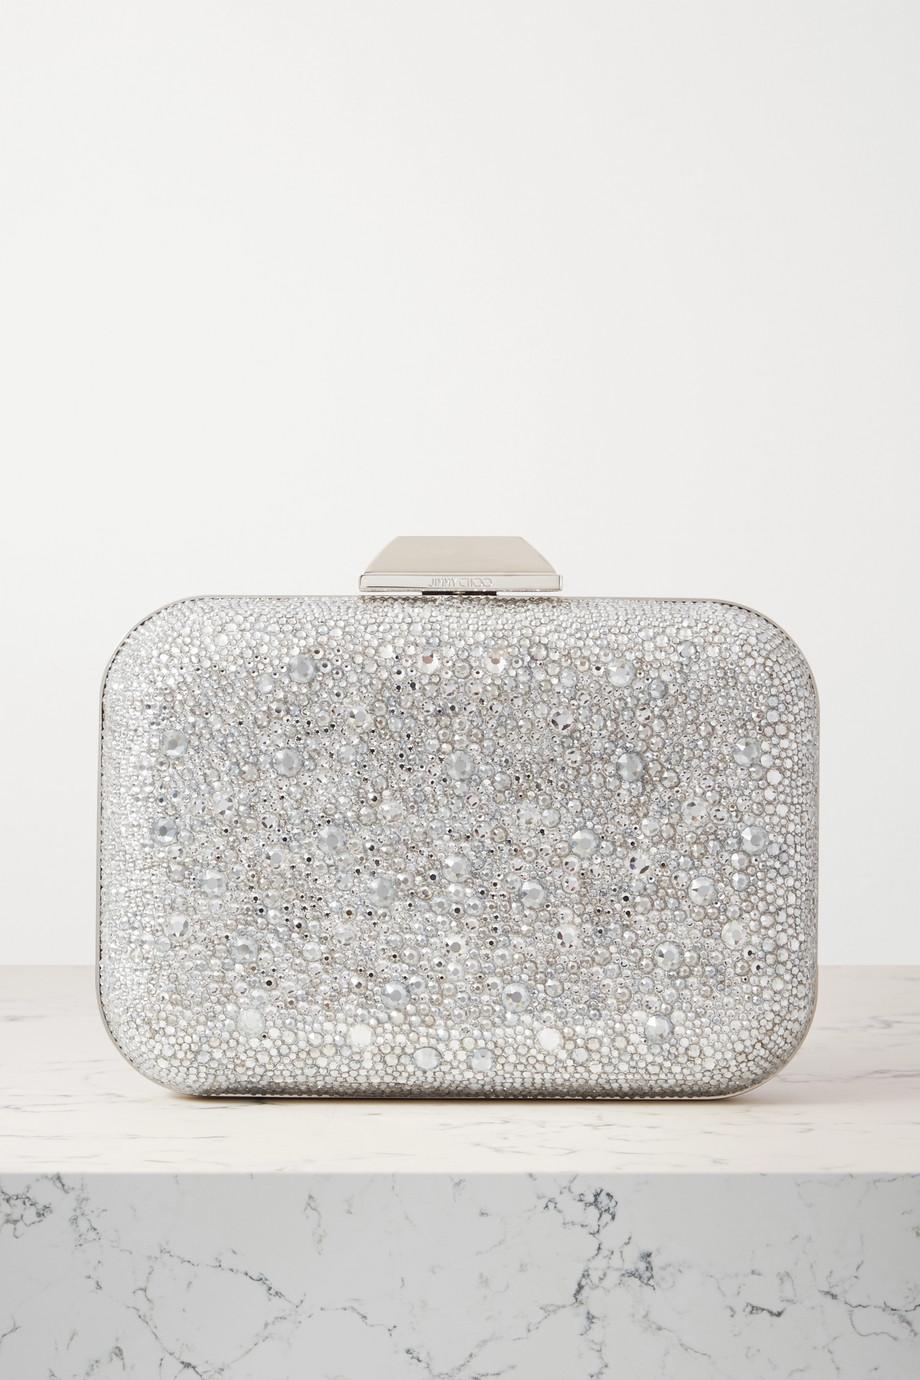 Jimmy Choo Cloud crystal-embellished metallic suede clutch